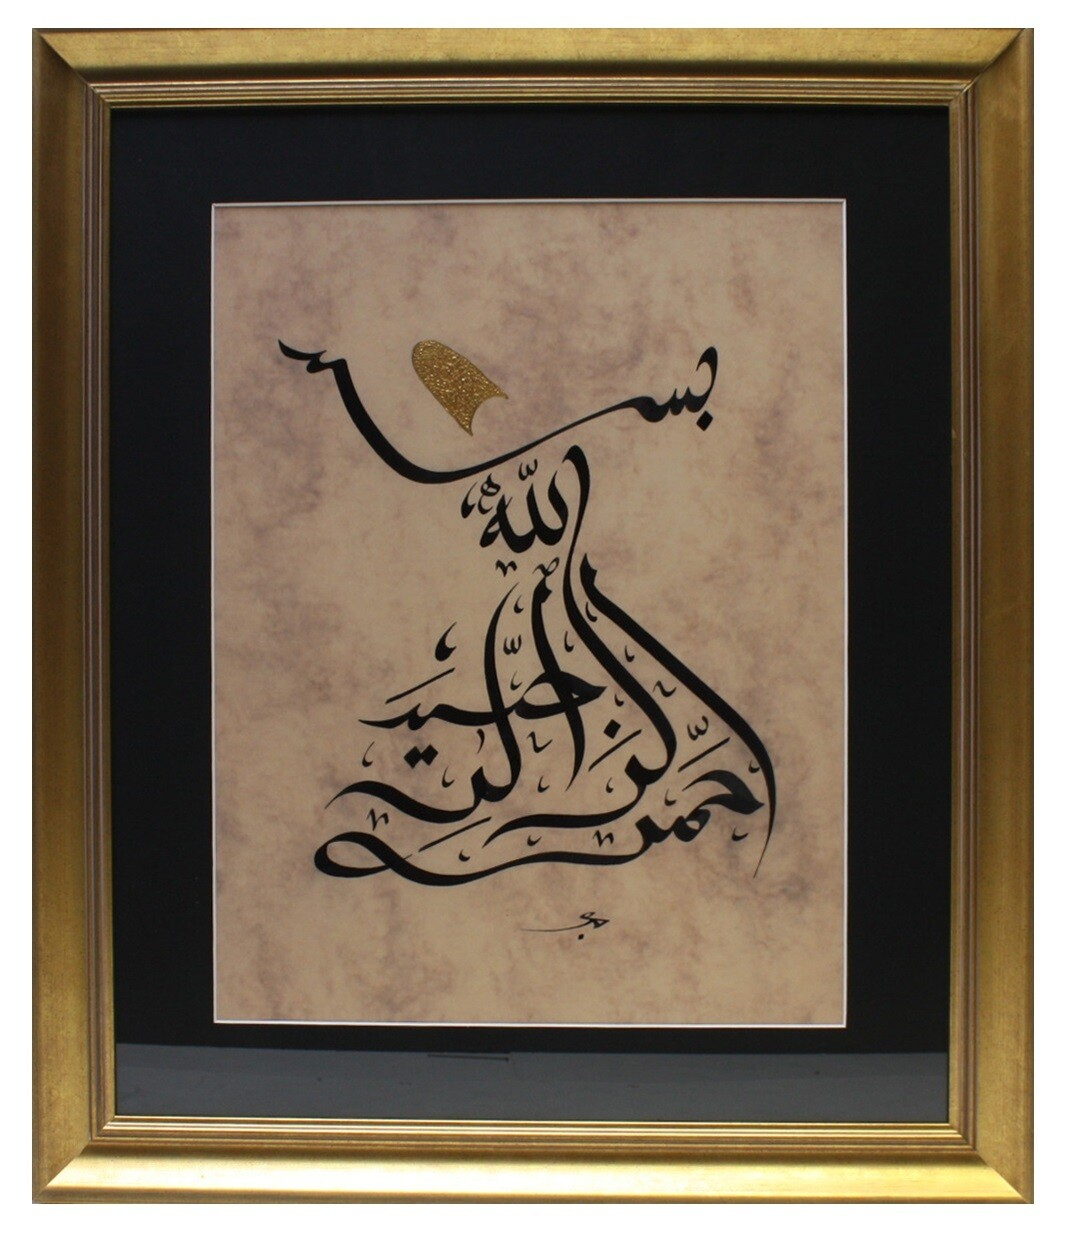 Bismillah Whirling Dervish Gold Handpainted Turban Design in Gold Curved Frame